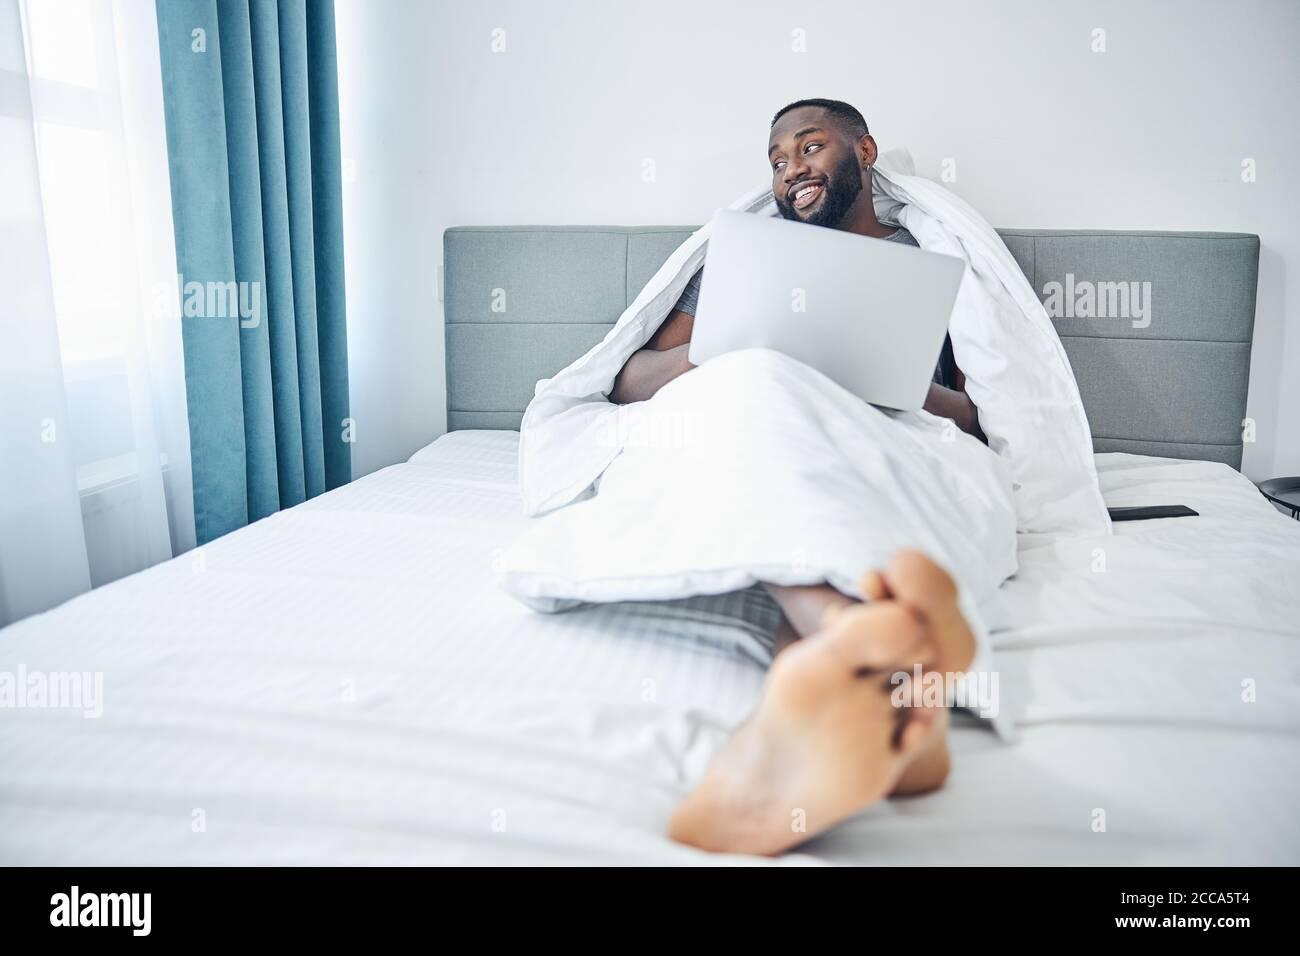 Hombre con barba alegre pasando un fin de semana en casa Foto de stock